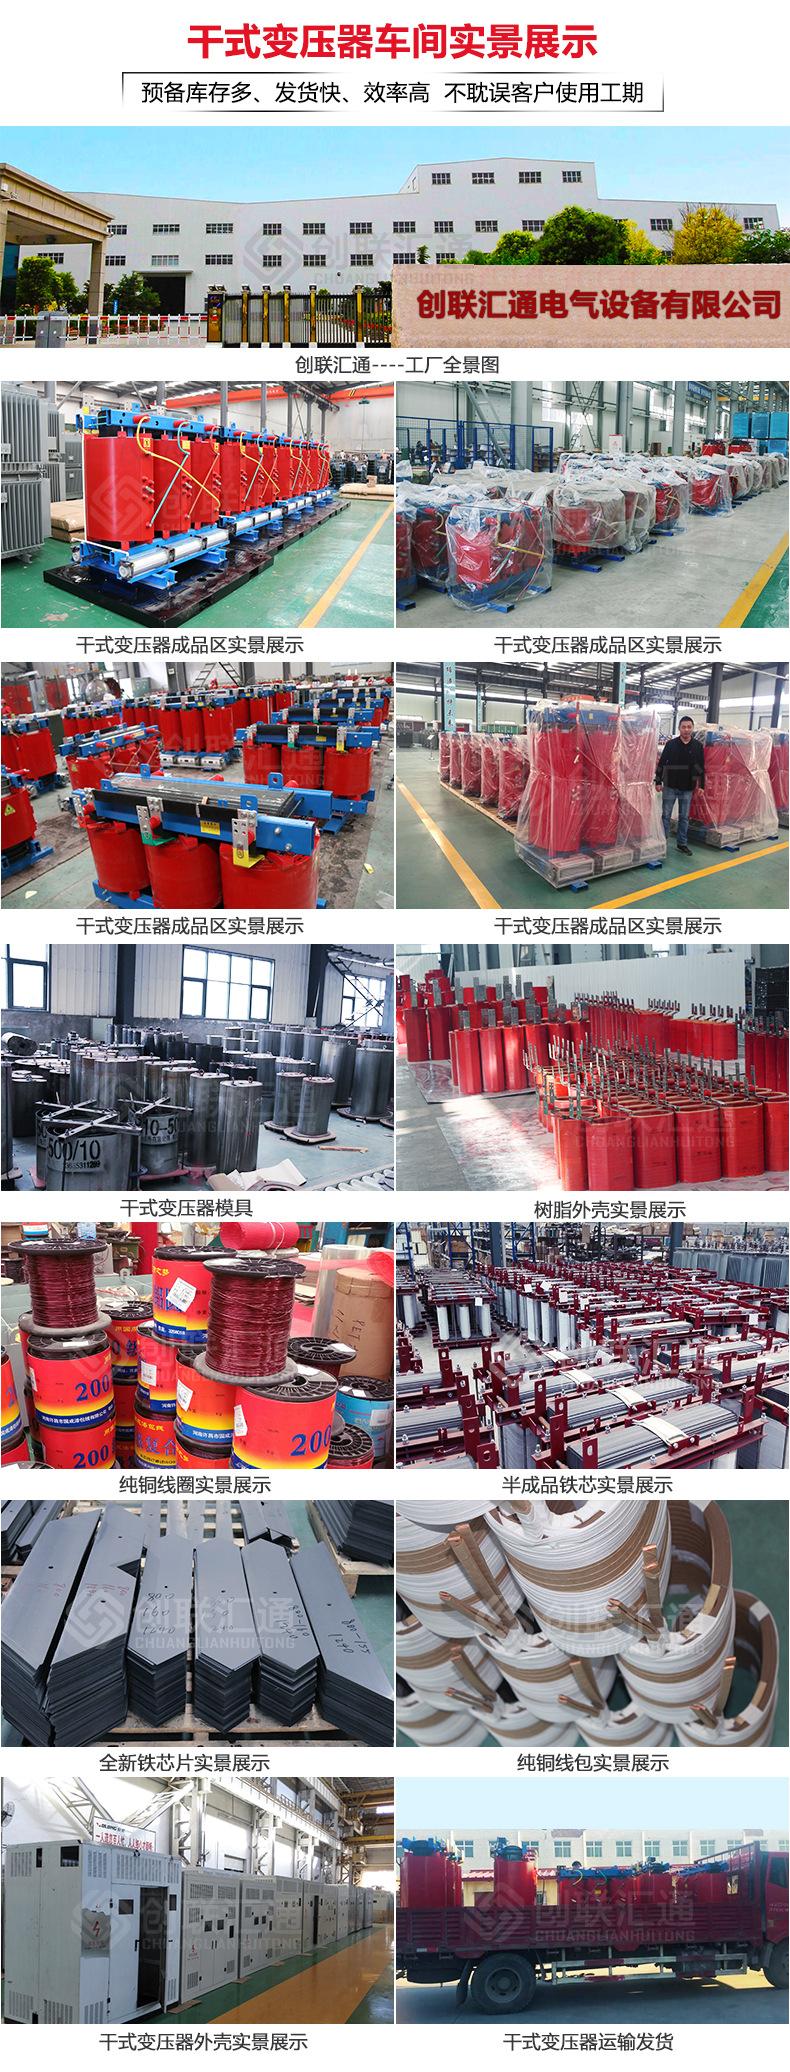 SCBH15-630/10非晶合金干式变压器 630KVA非晶干变 SCBH15非晶变压器-创联汇通示例图11